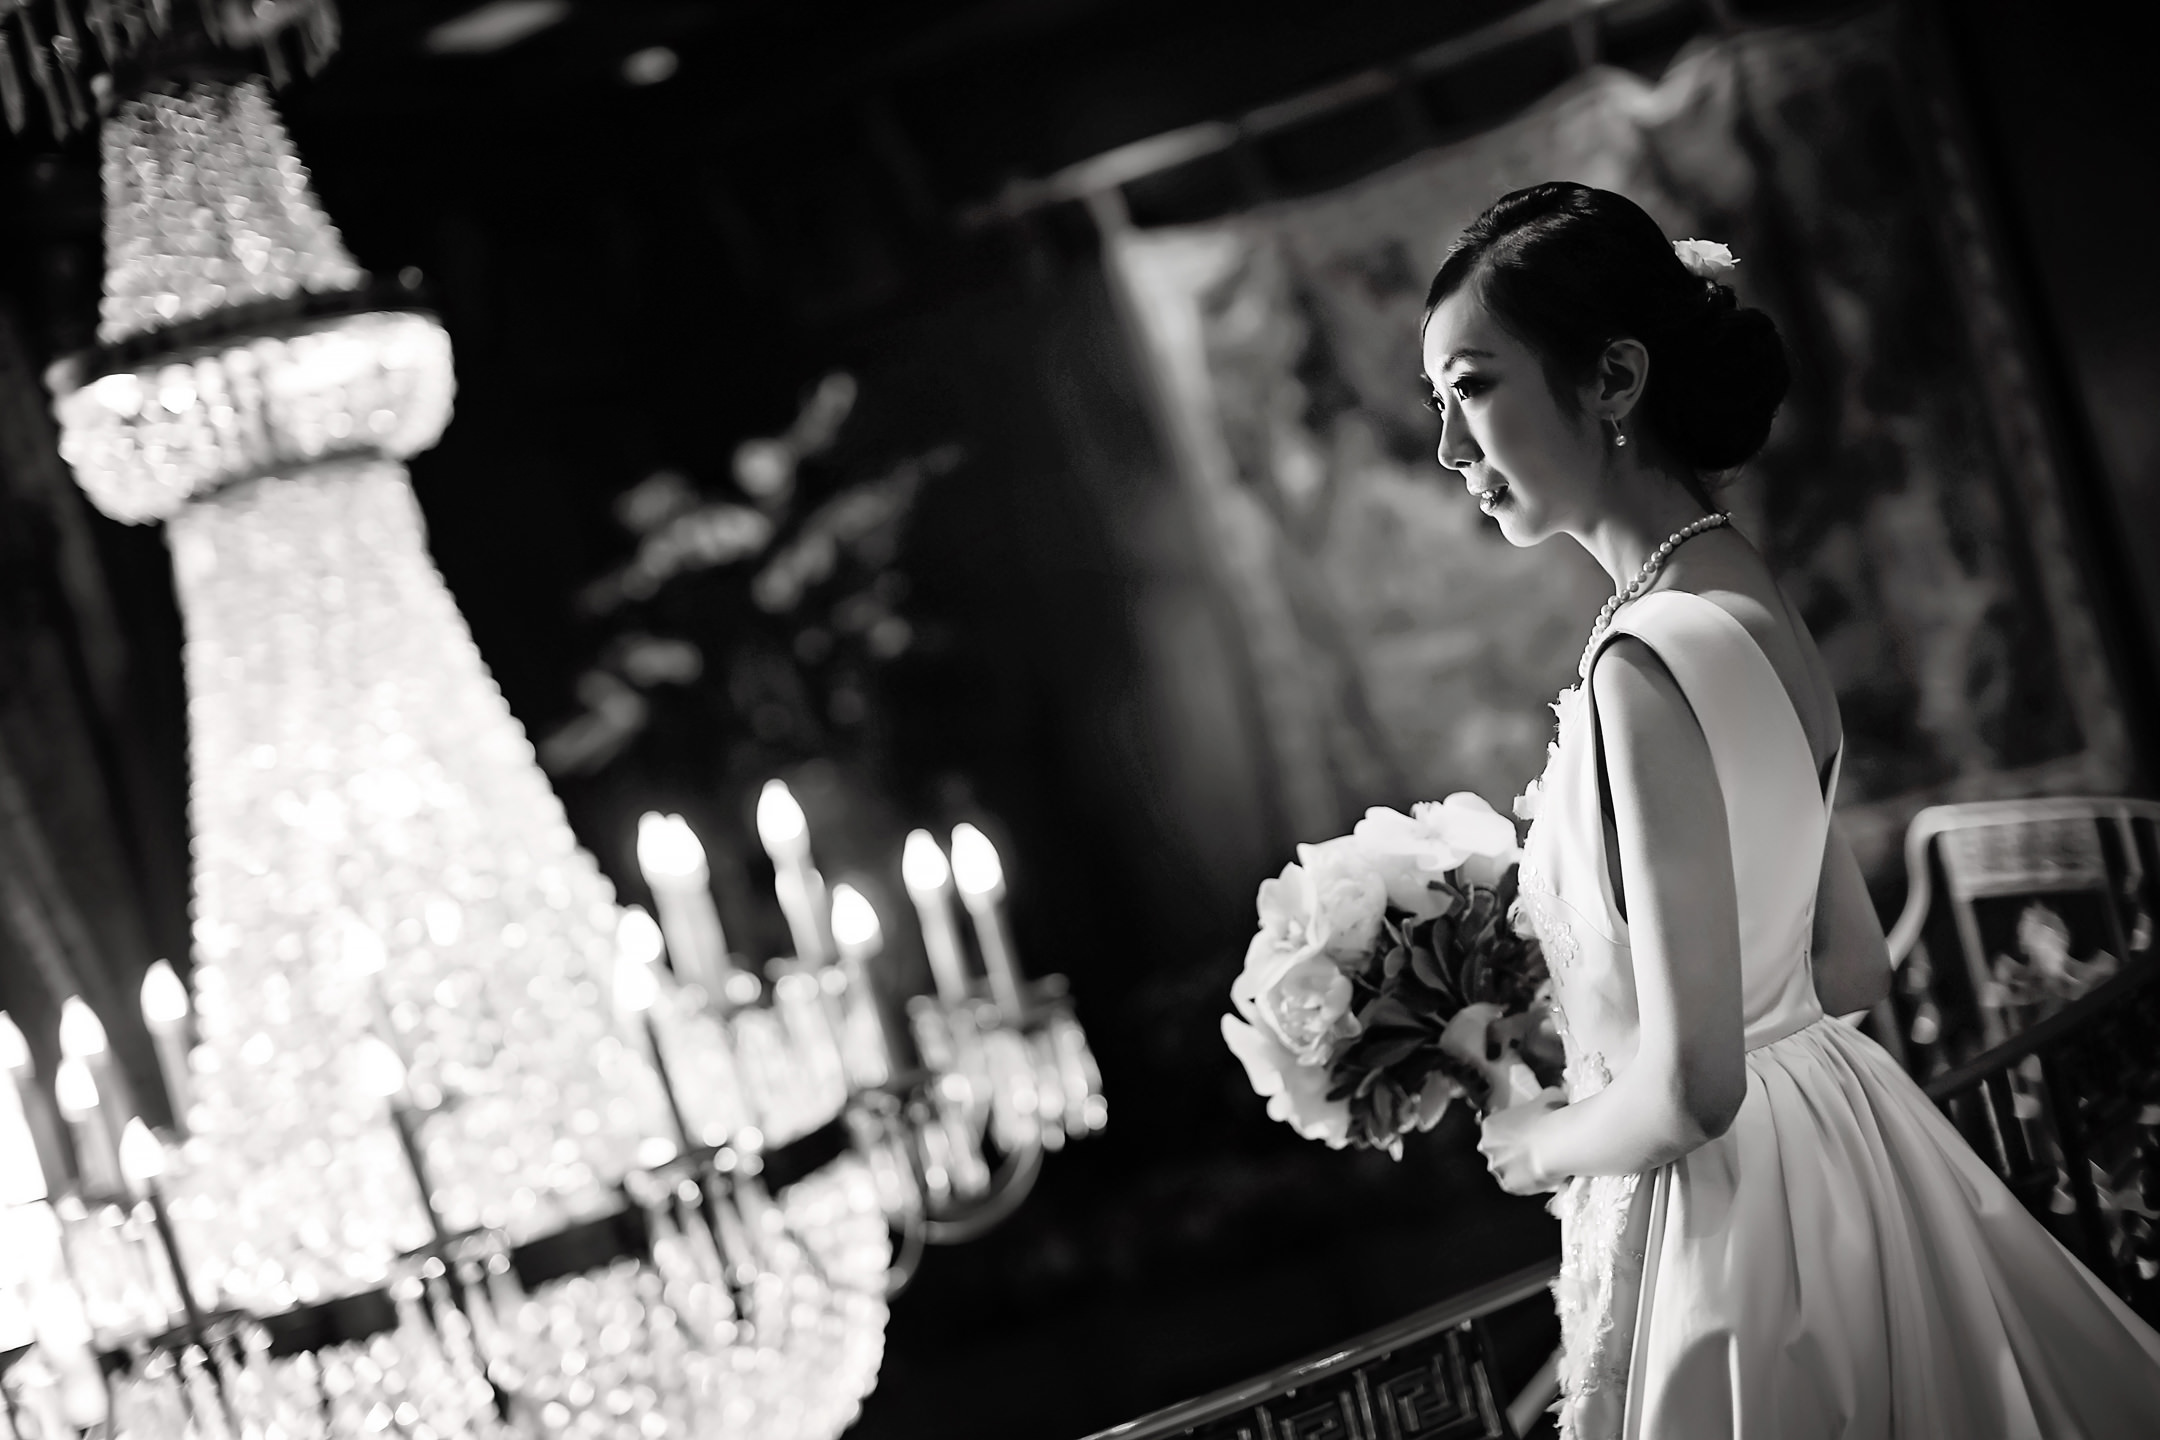 the_Manor-New_Jersey_NJ_Wedding002_Wedding001_Chris_Hui_Photoraphy.JPG